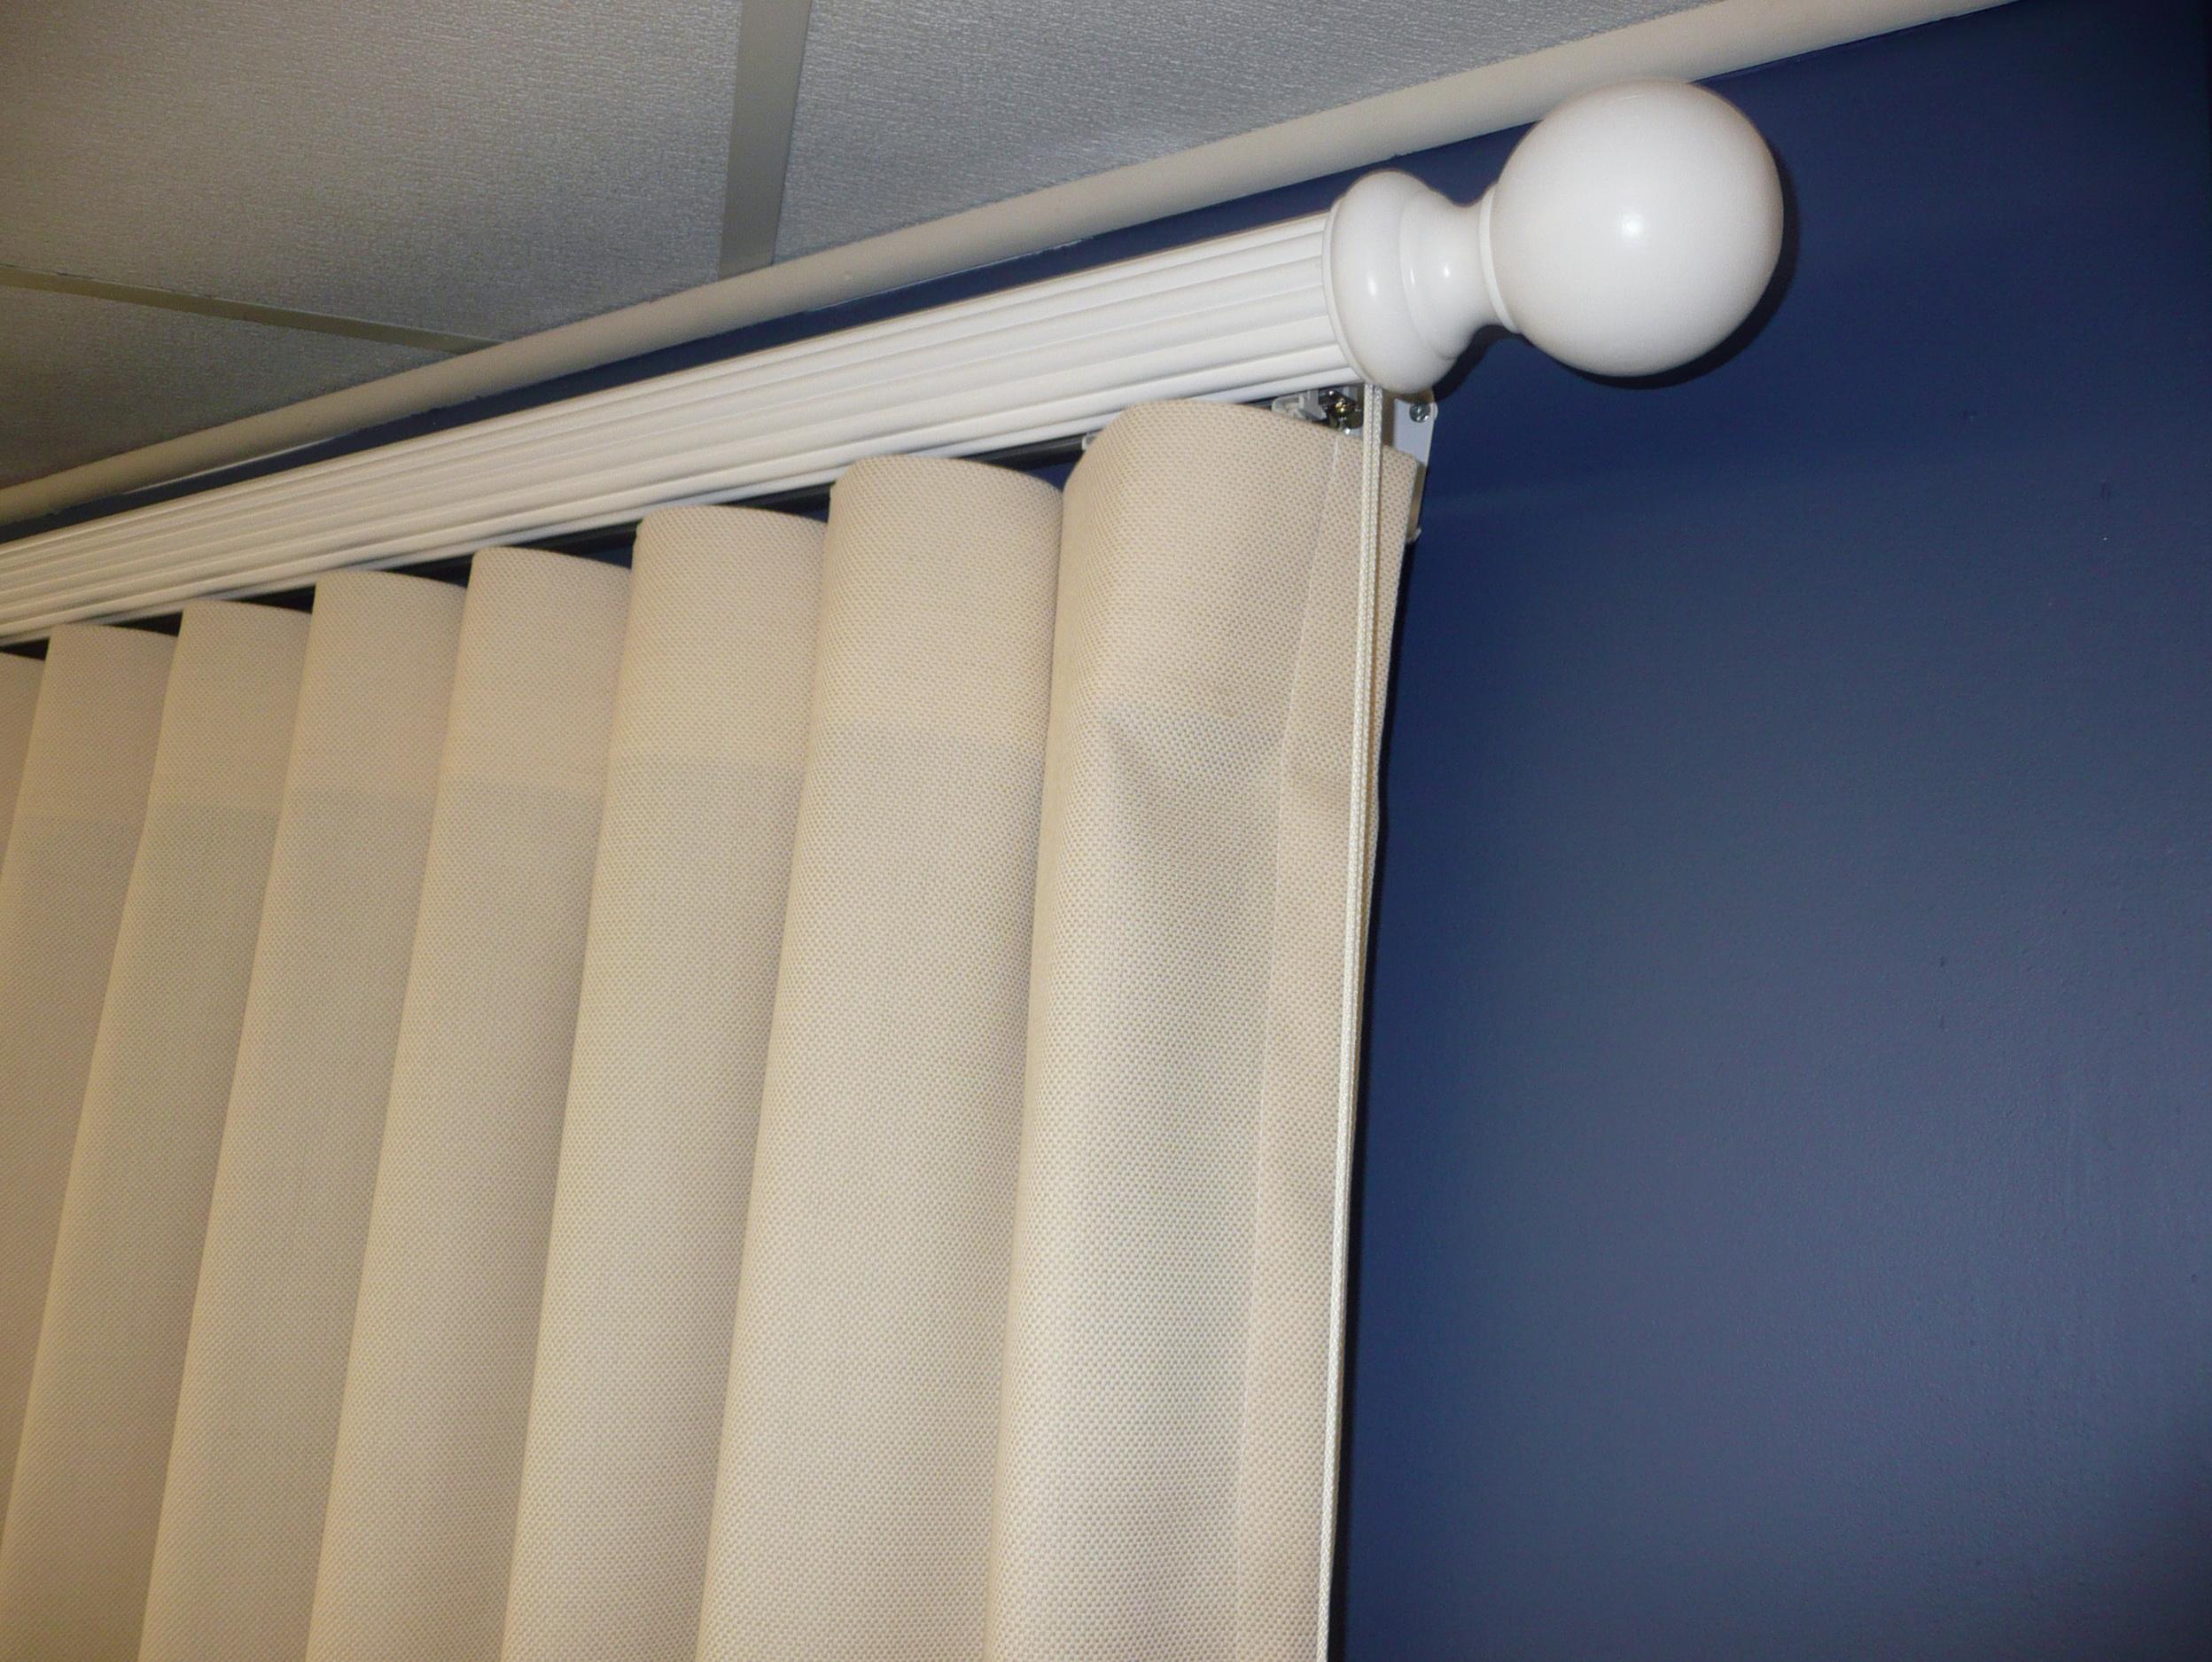 Traverse Rod Curtains Drapes